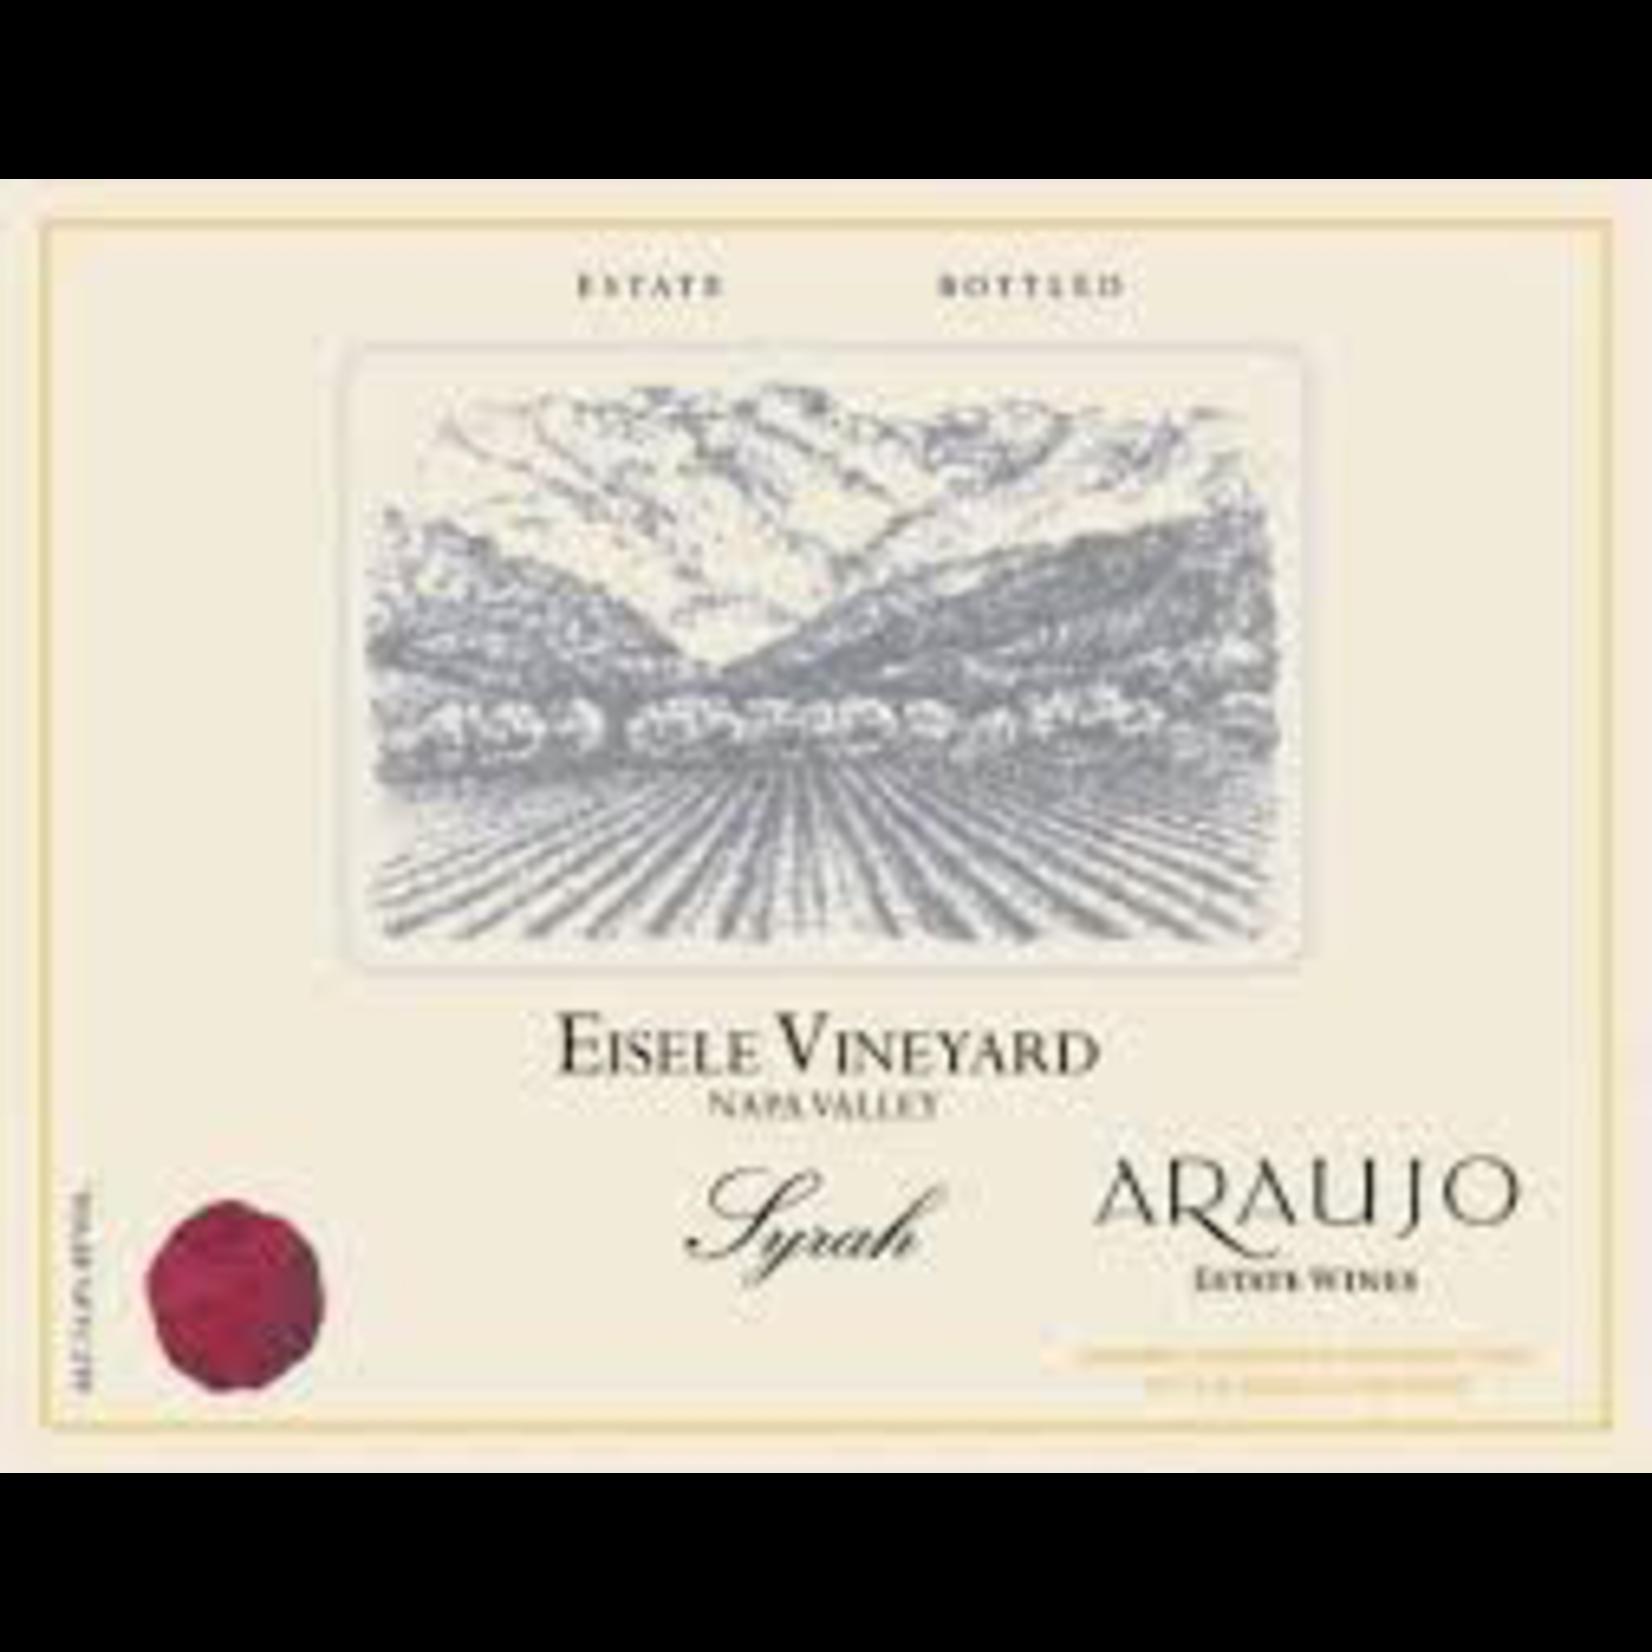 Araujo Estate Syrah Eisele Vineyard Napa Valley 2005